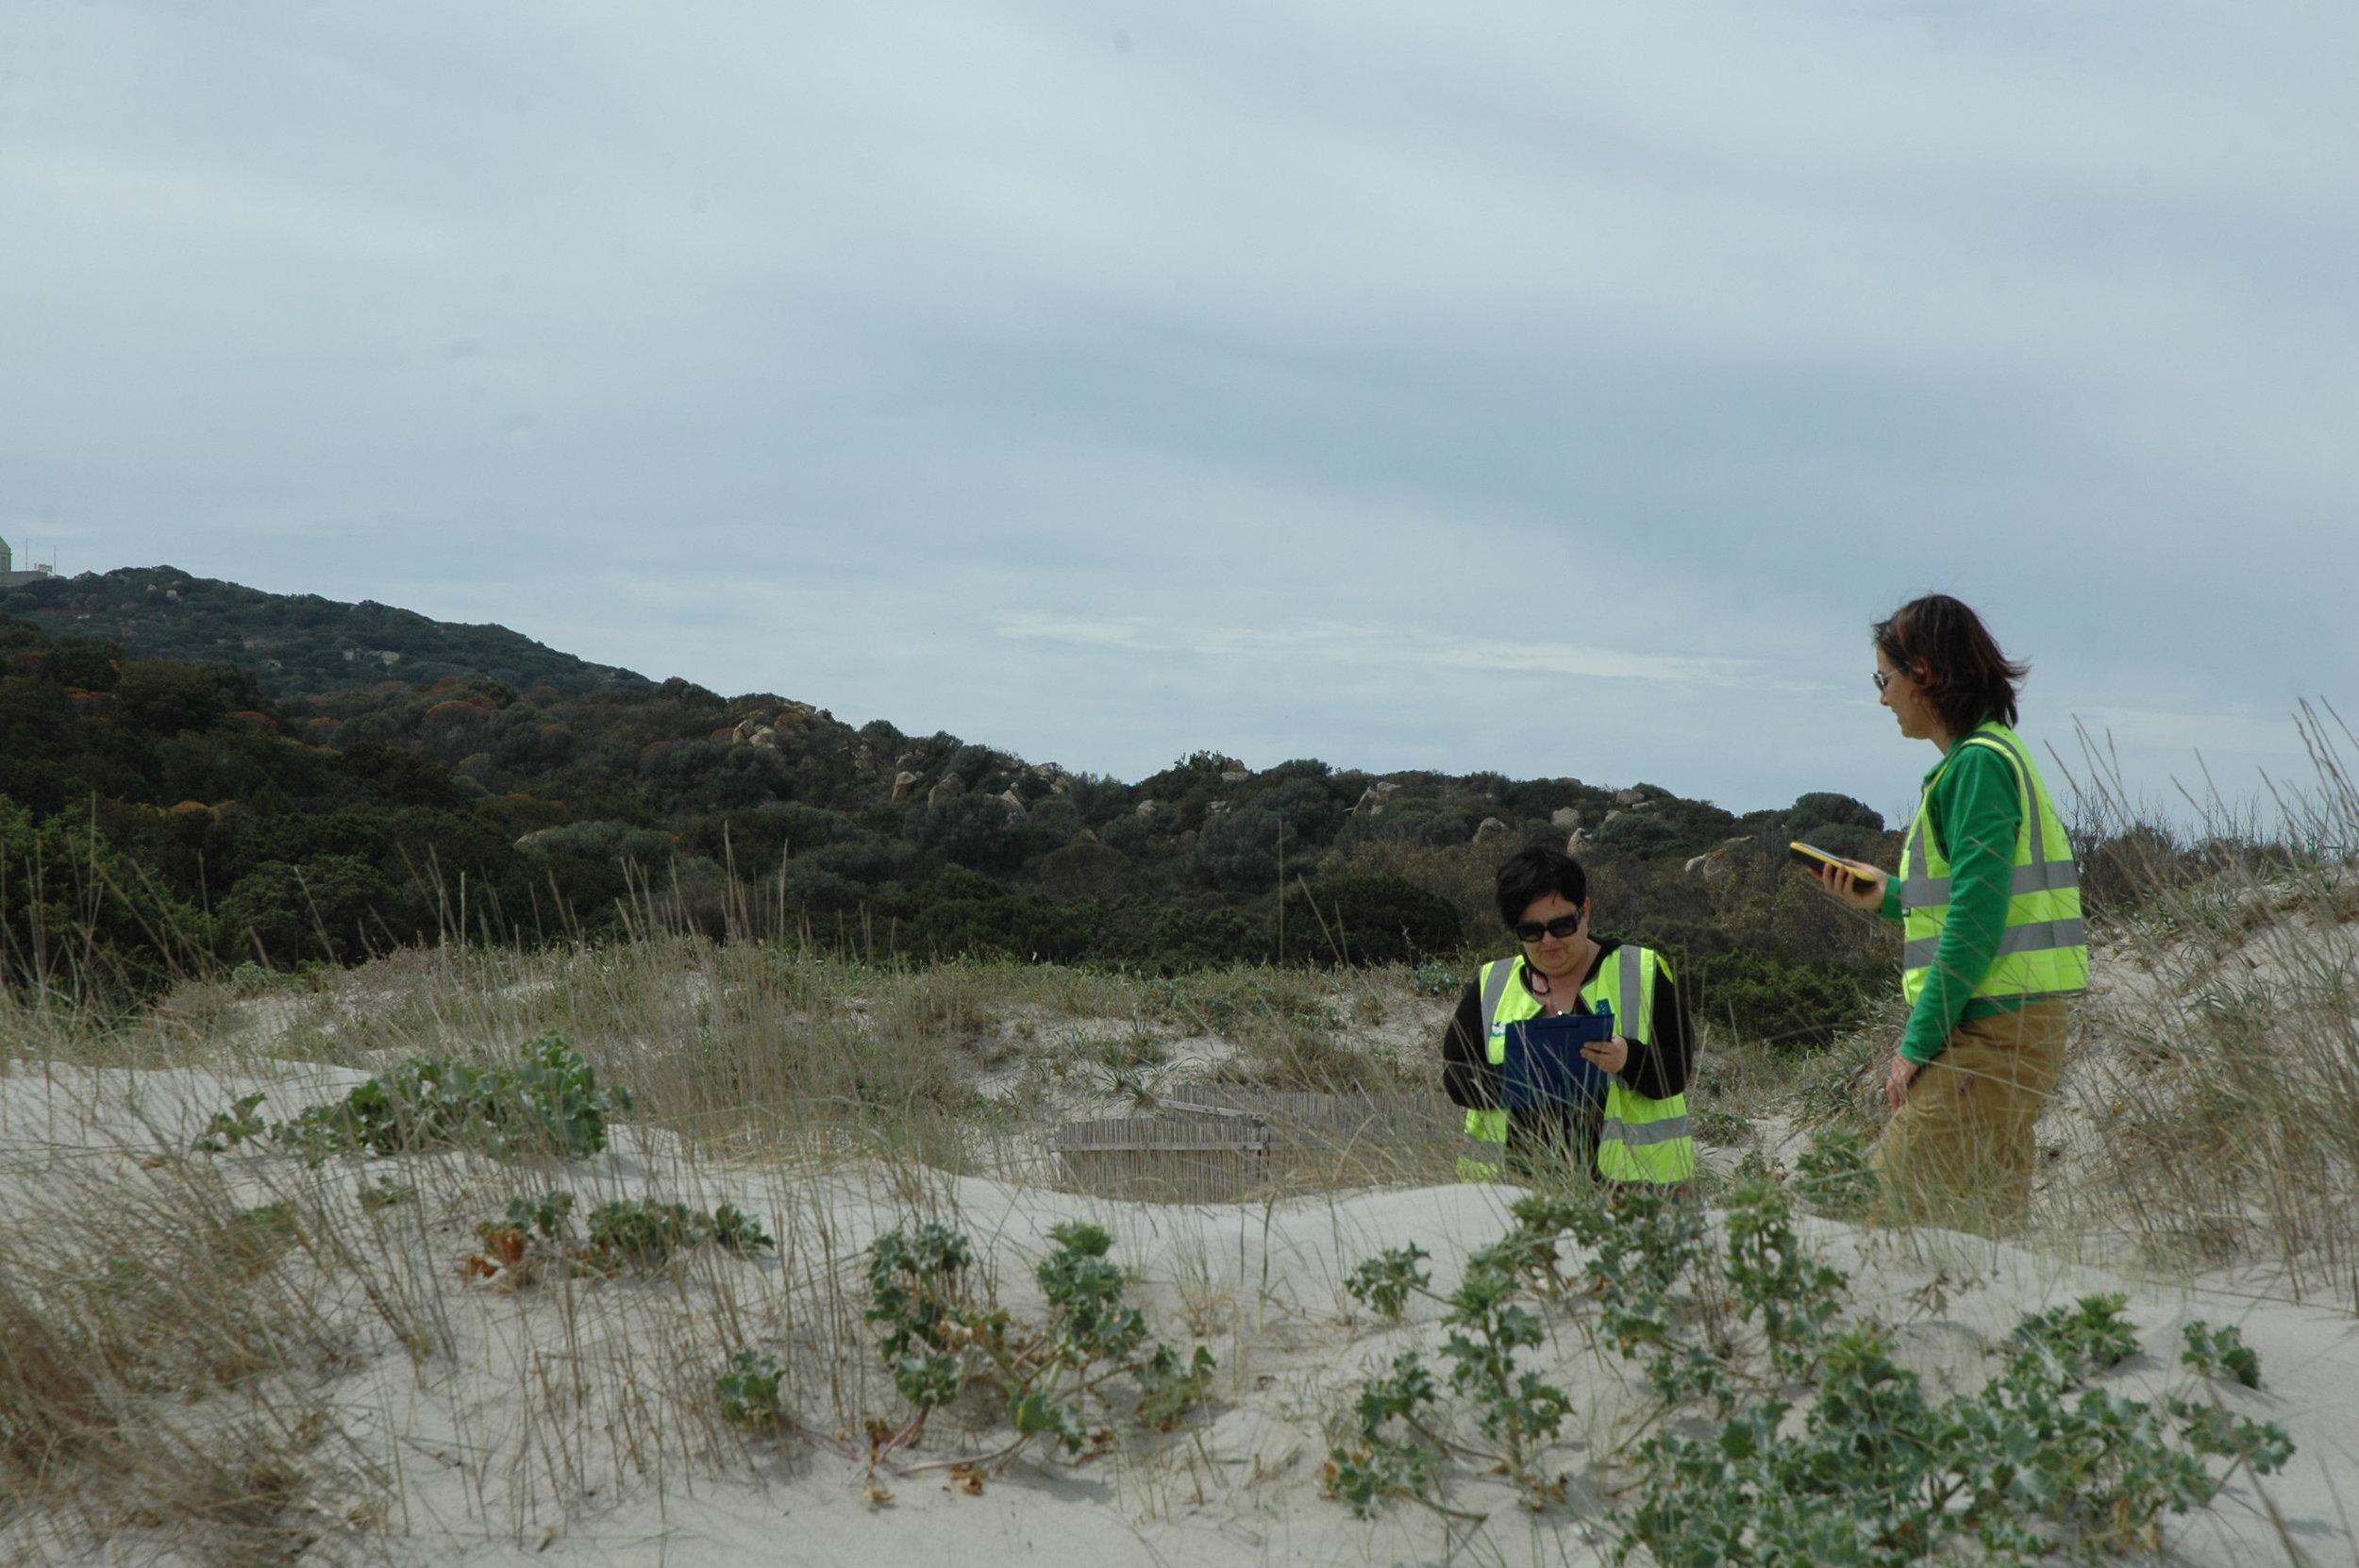 Monitoring of sand dune habitats